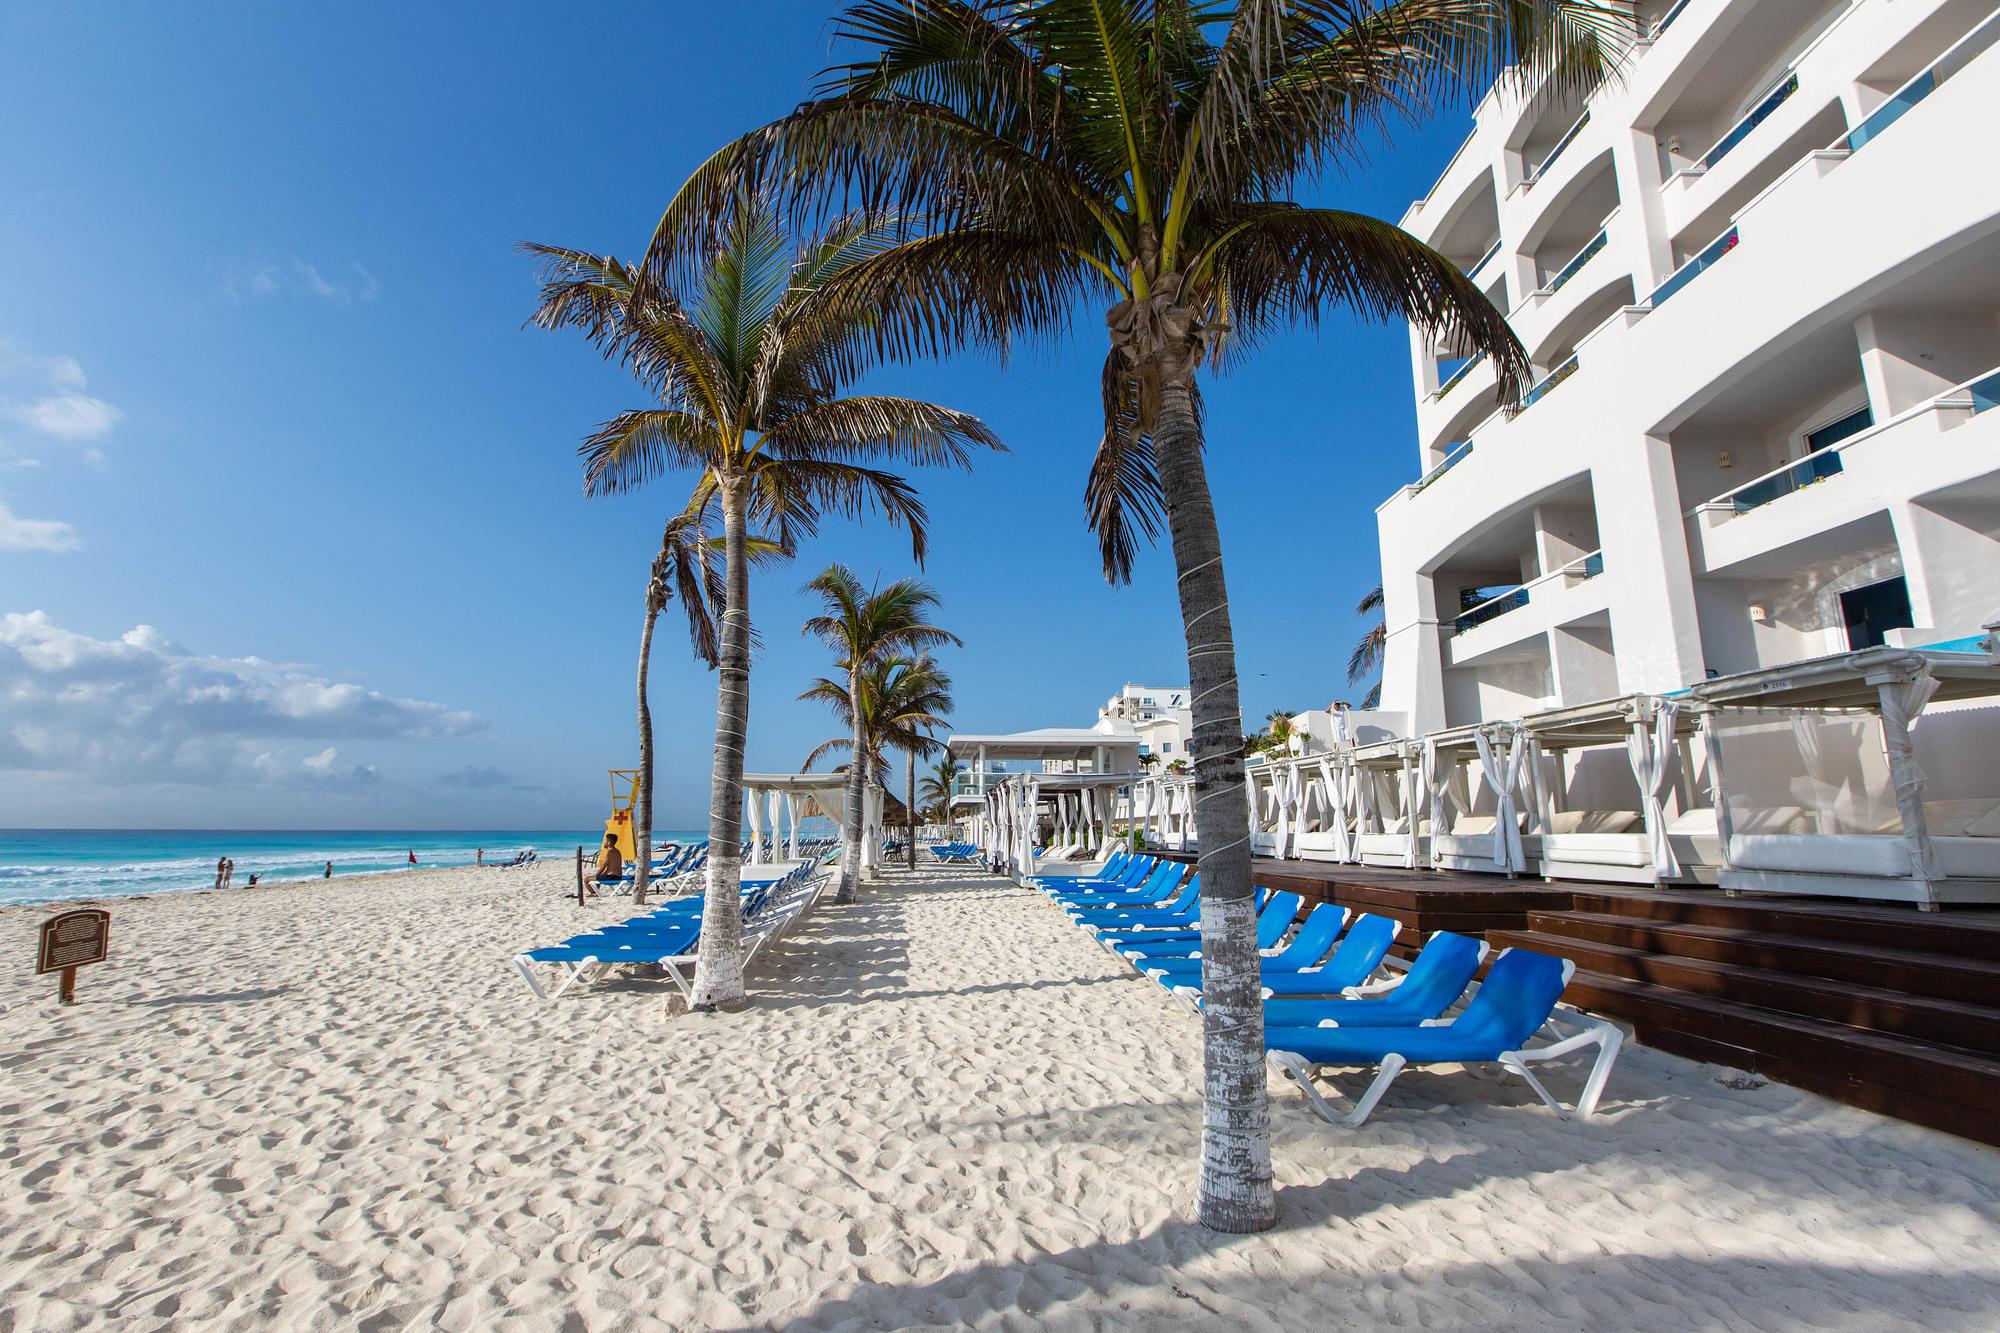 The beach at Panama Jack Resorts Cancun